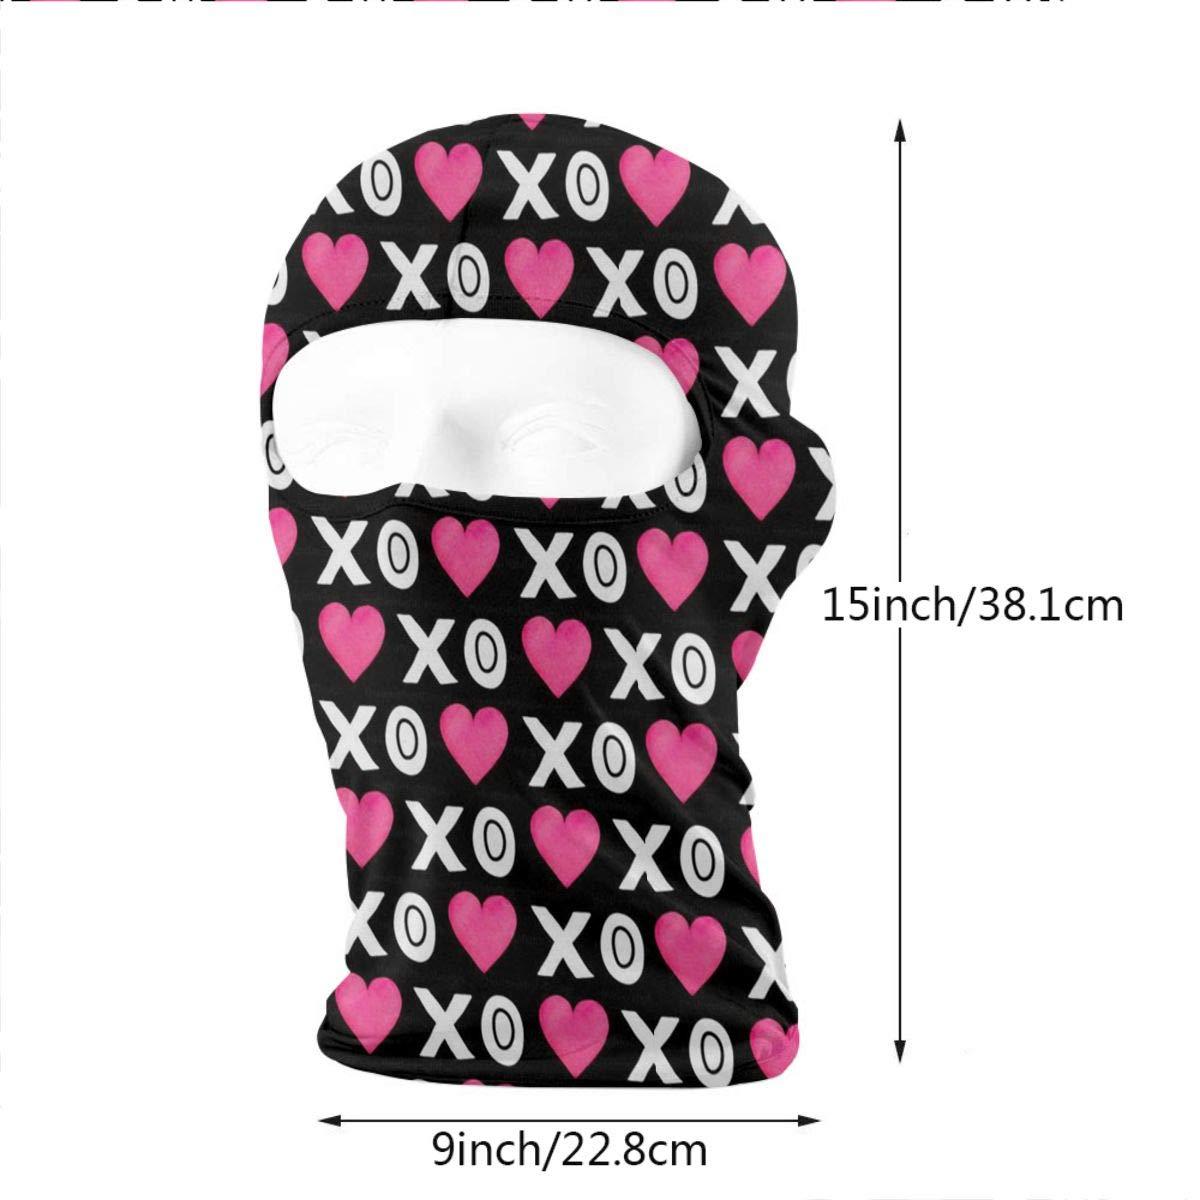 Gomop Ski Cap XO Love Full Face Mask Wind-Resistant Face Mask